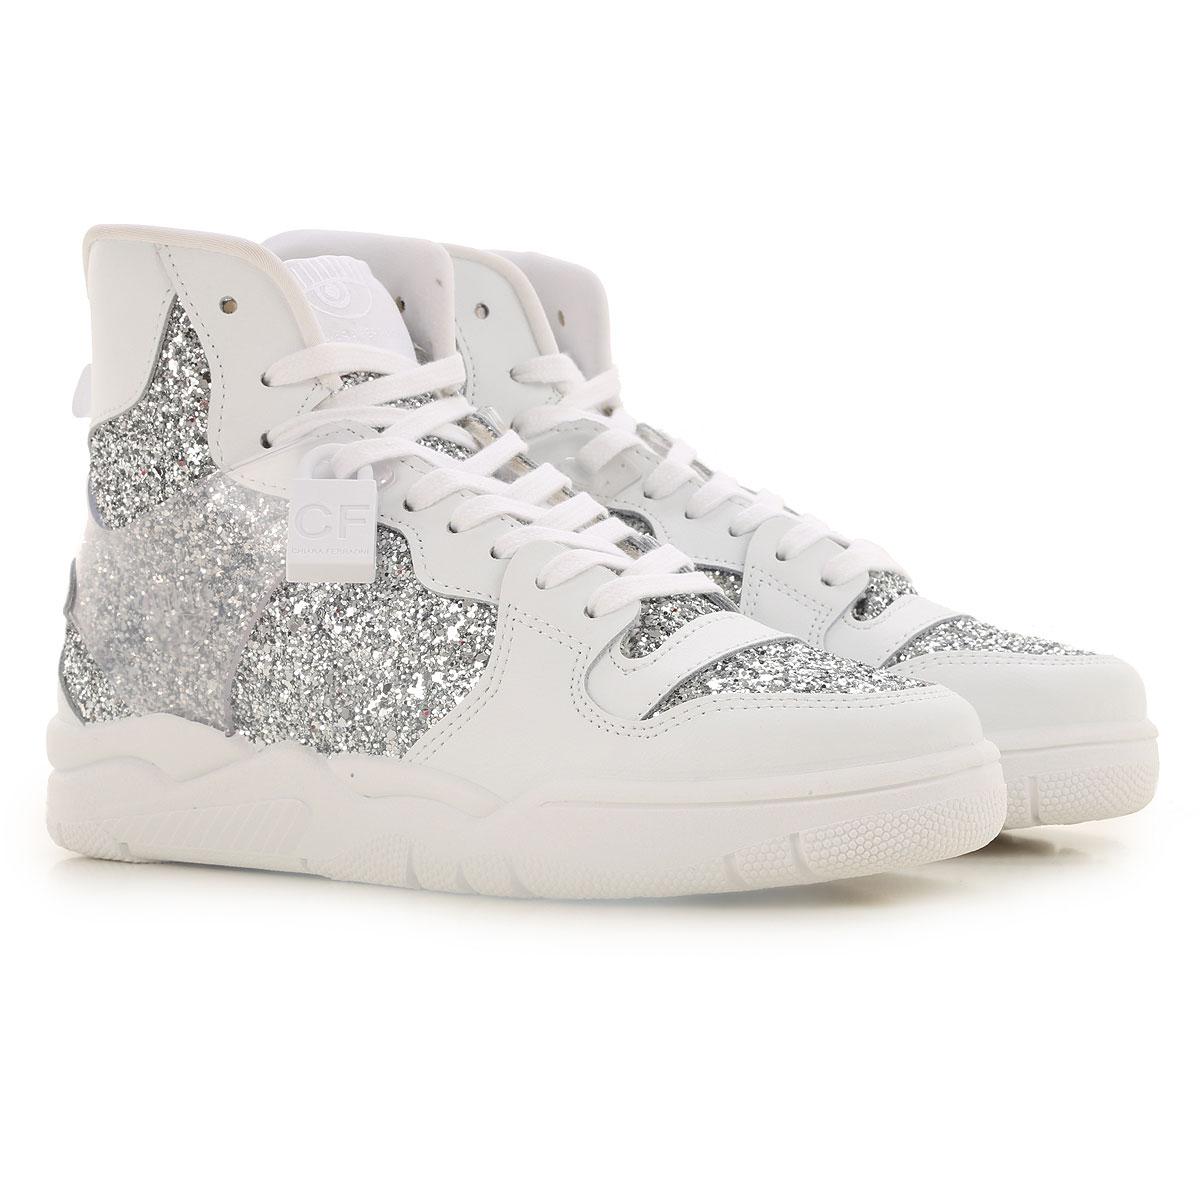 Chiara Ferragni Sneakers for Women On Sale, White, Leather, 2019, 10 11 5 6 7 8 9